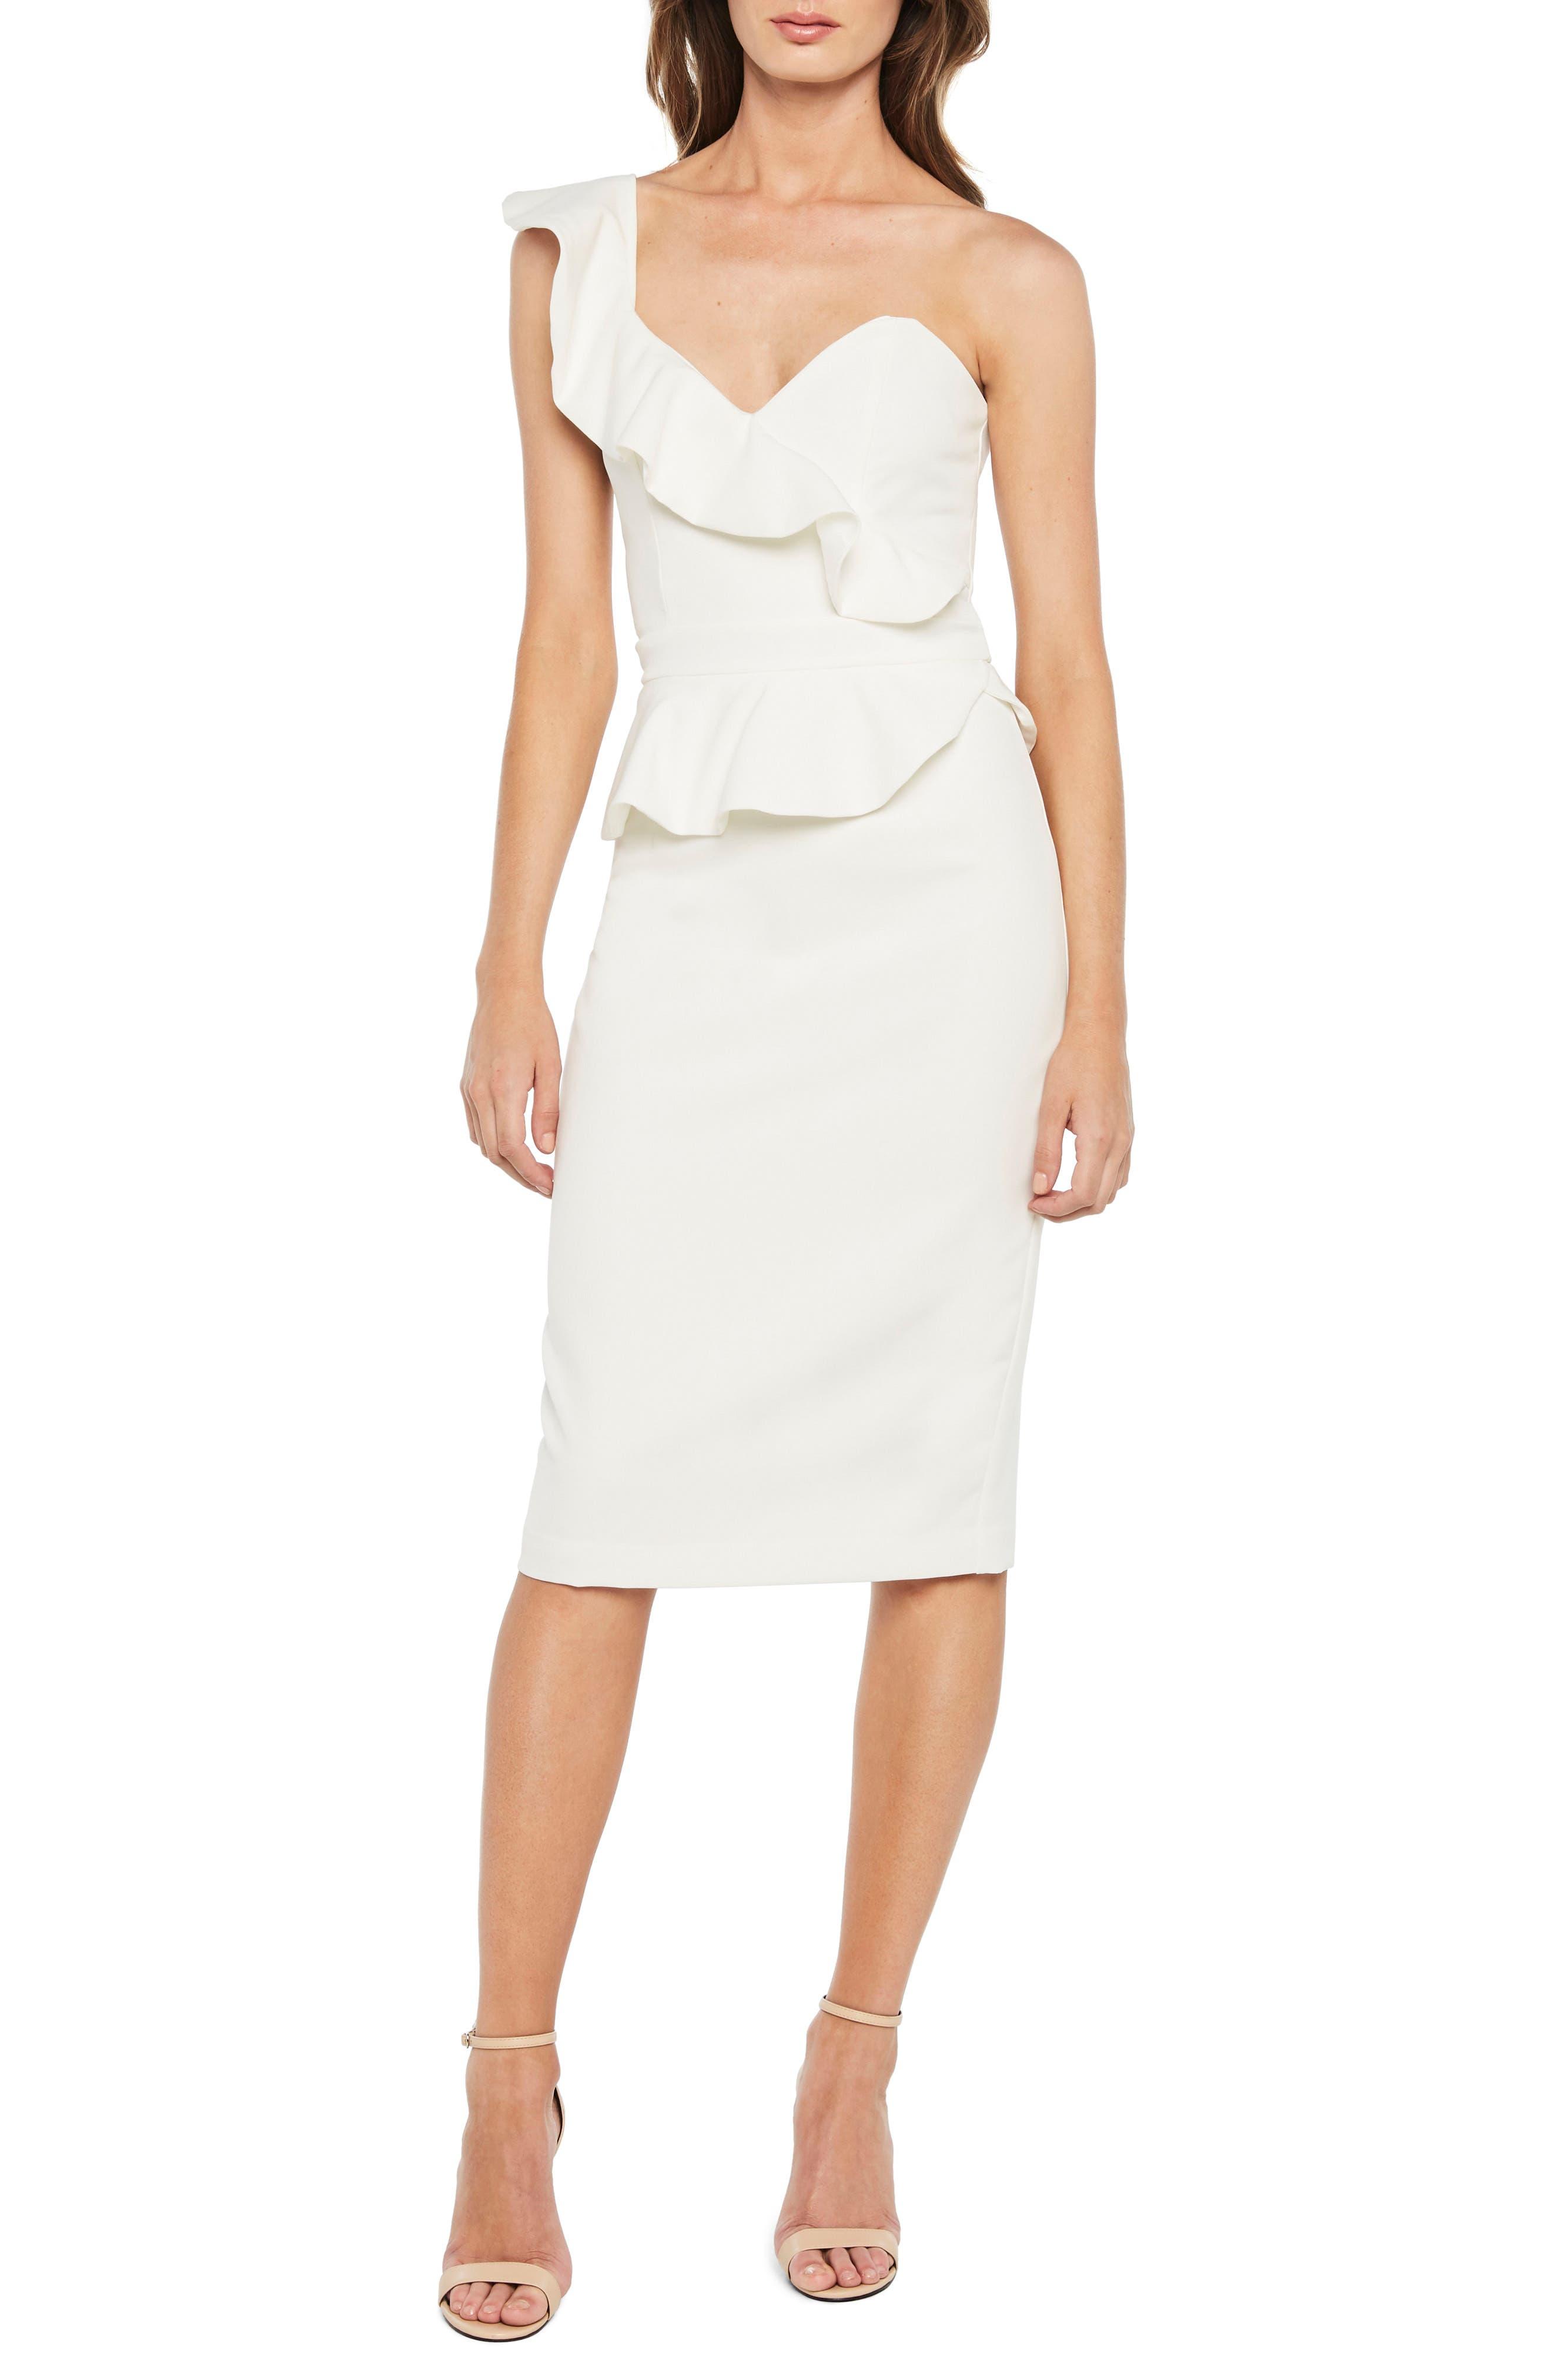 Camellia One-Shoulder Sheath Dress,                             Main thumbnail 1, color,                             Ivory